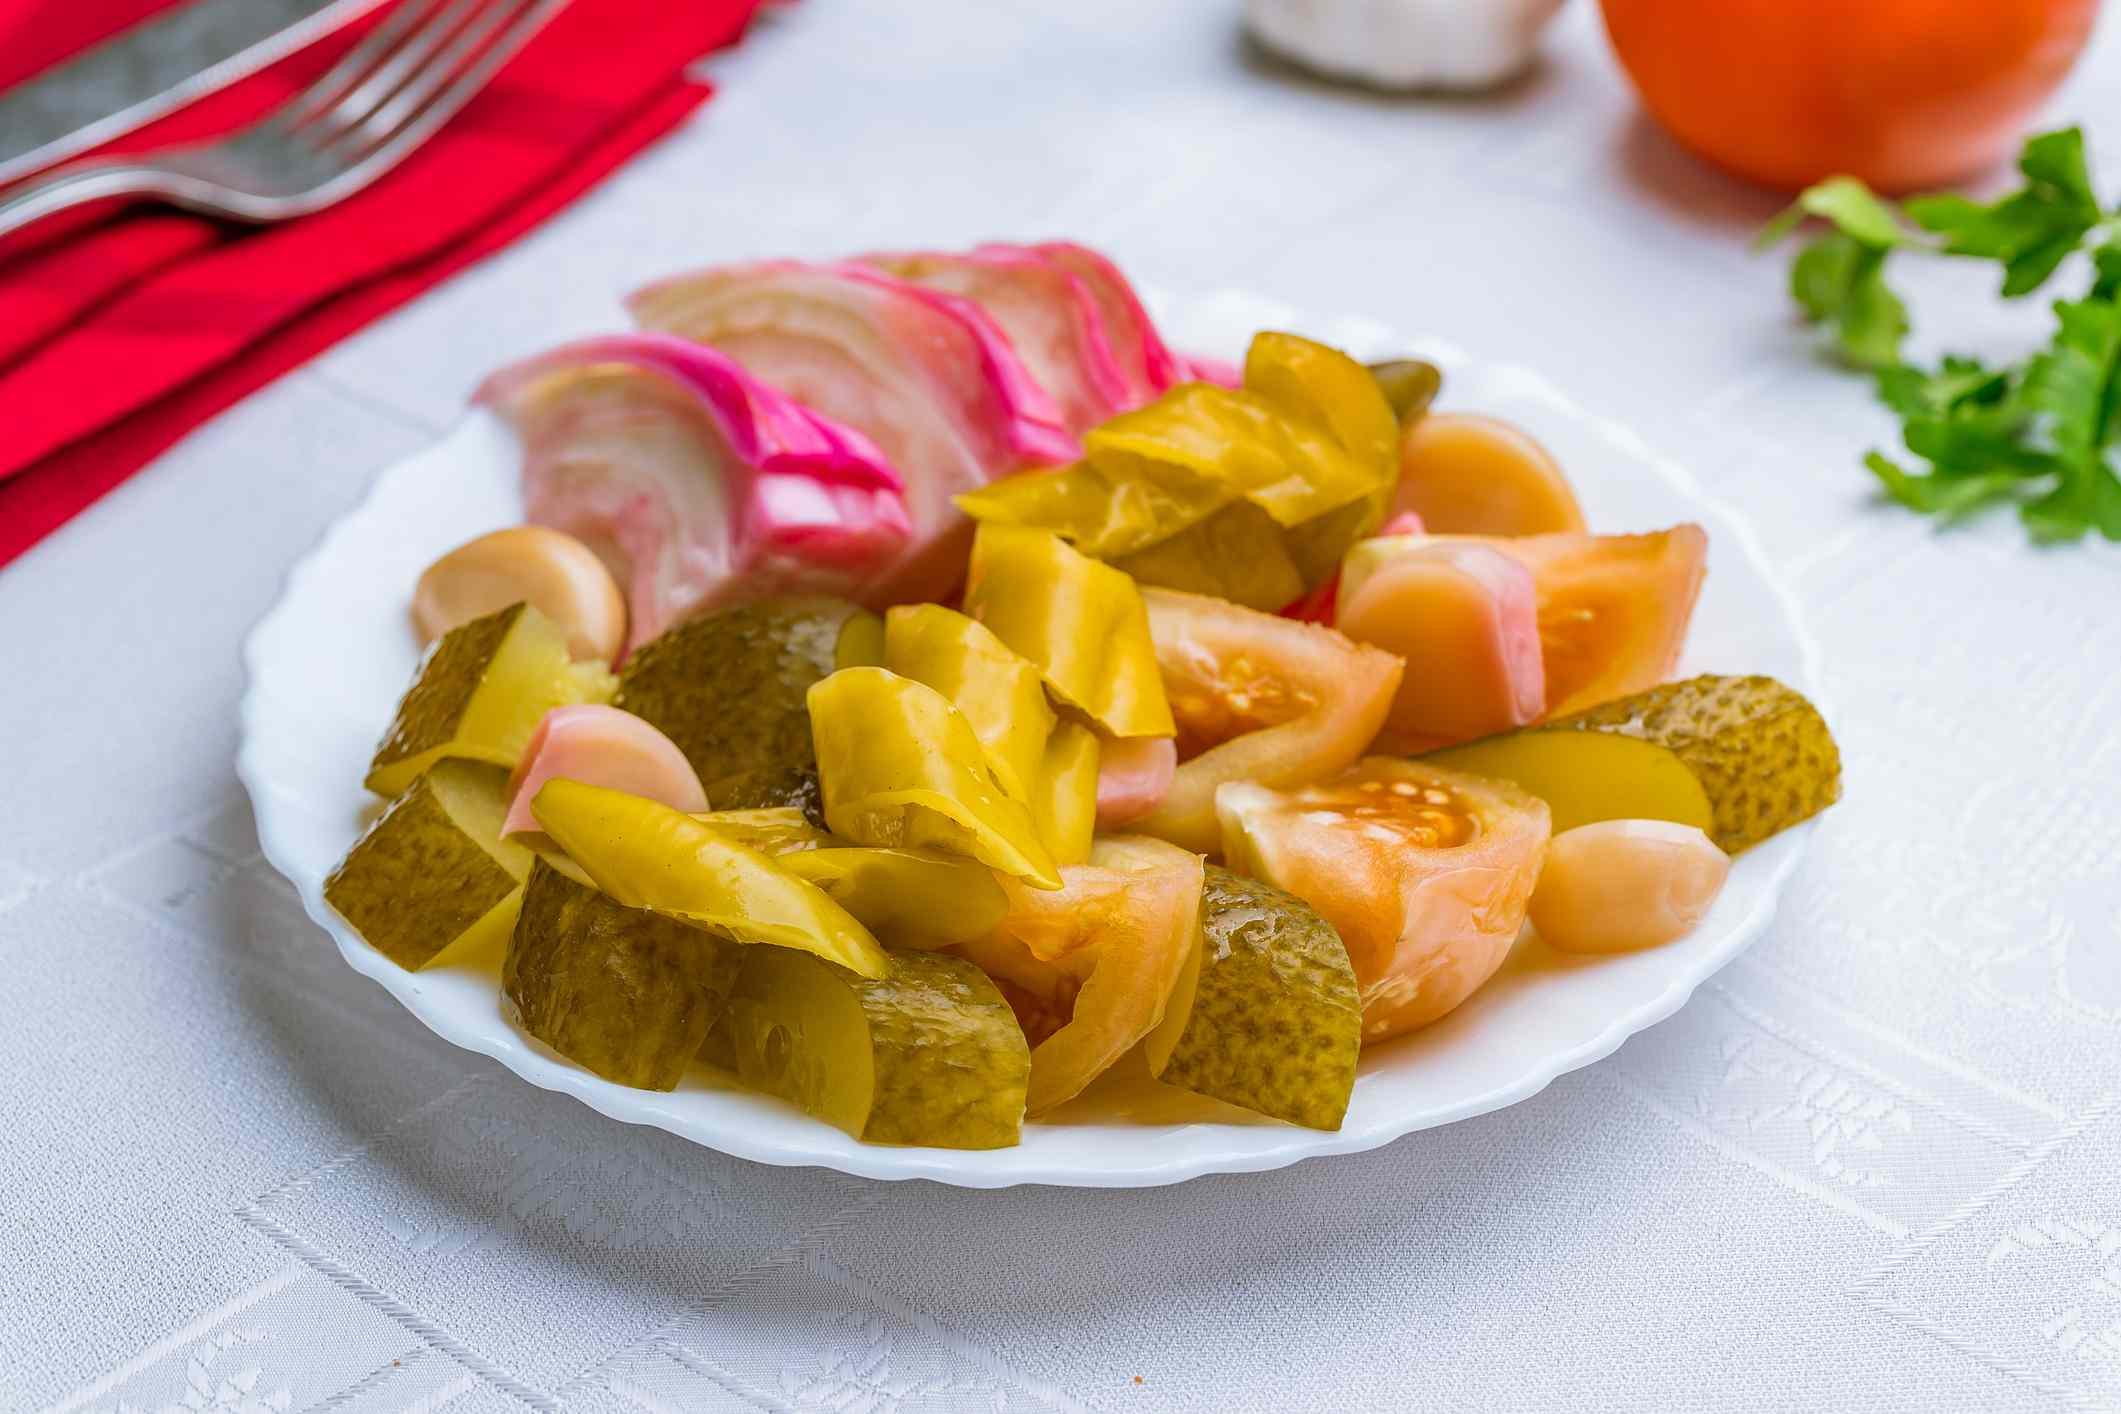 Plate of pickled vegetables